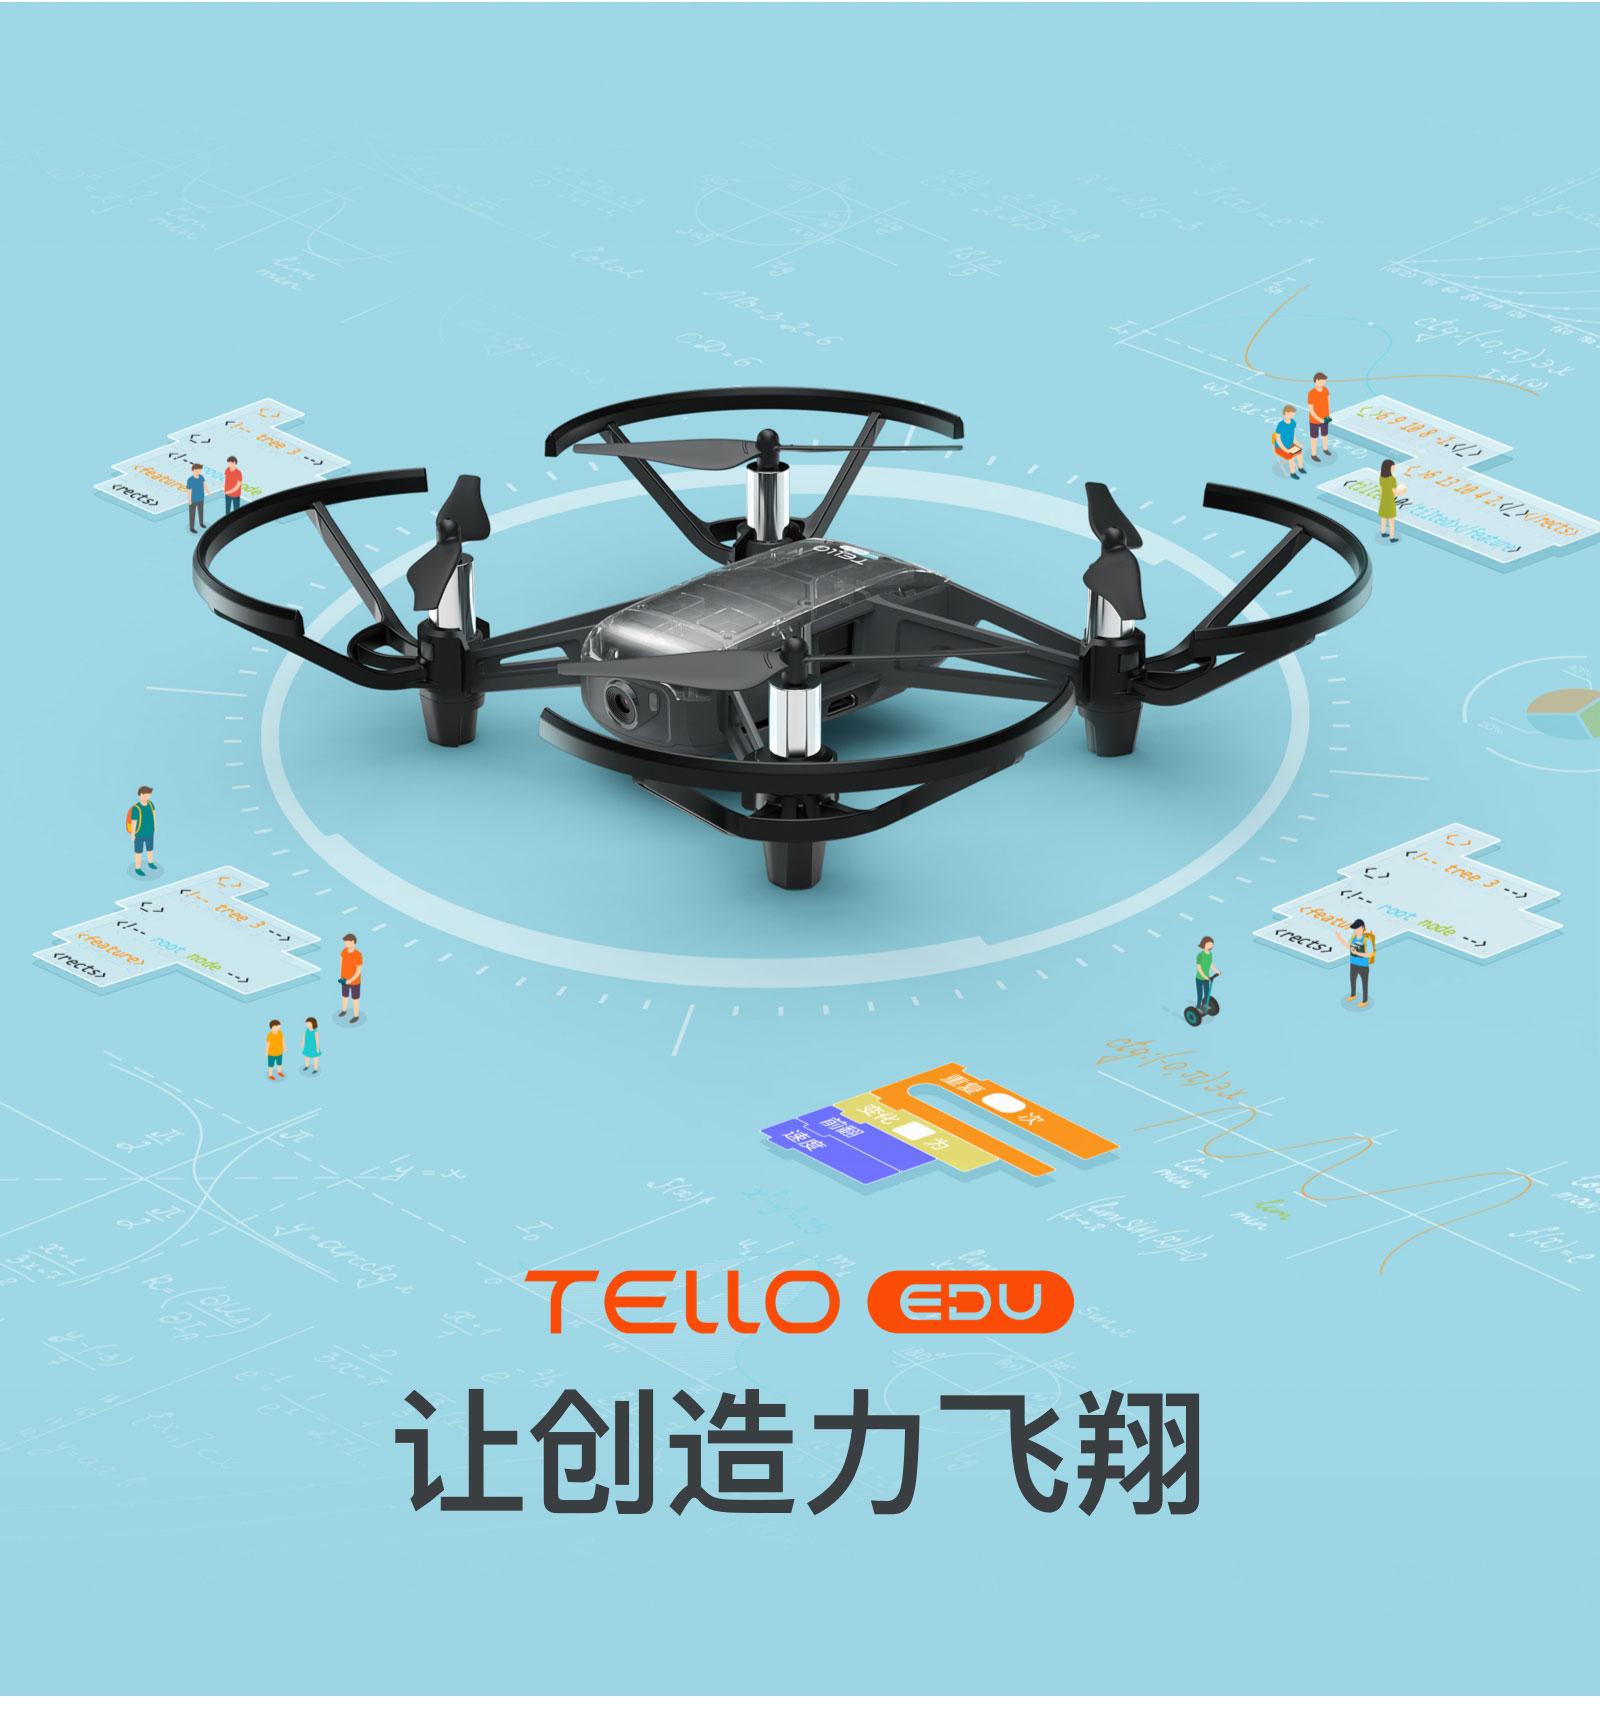 tello-edu-cn-m800-copy_01.jpg